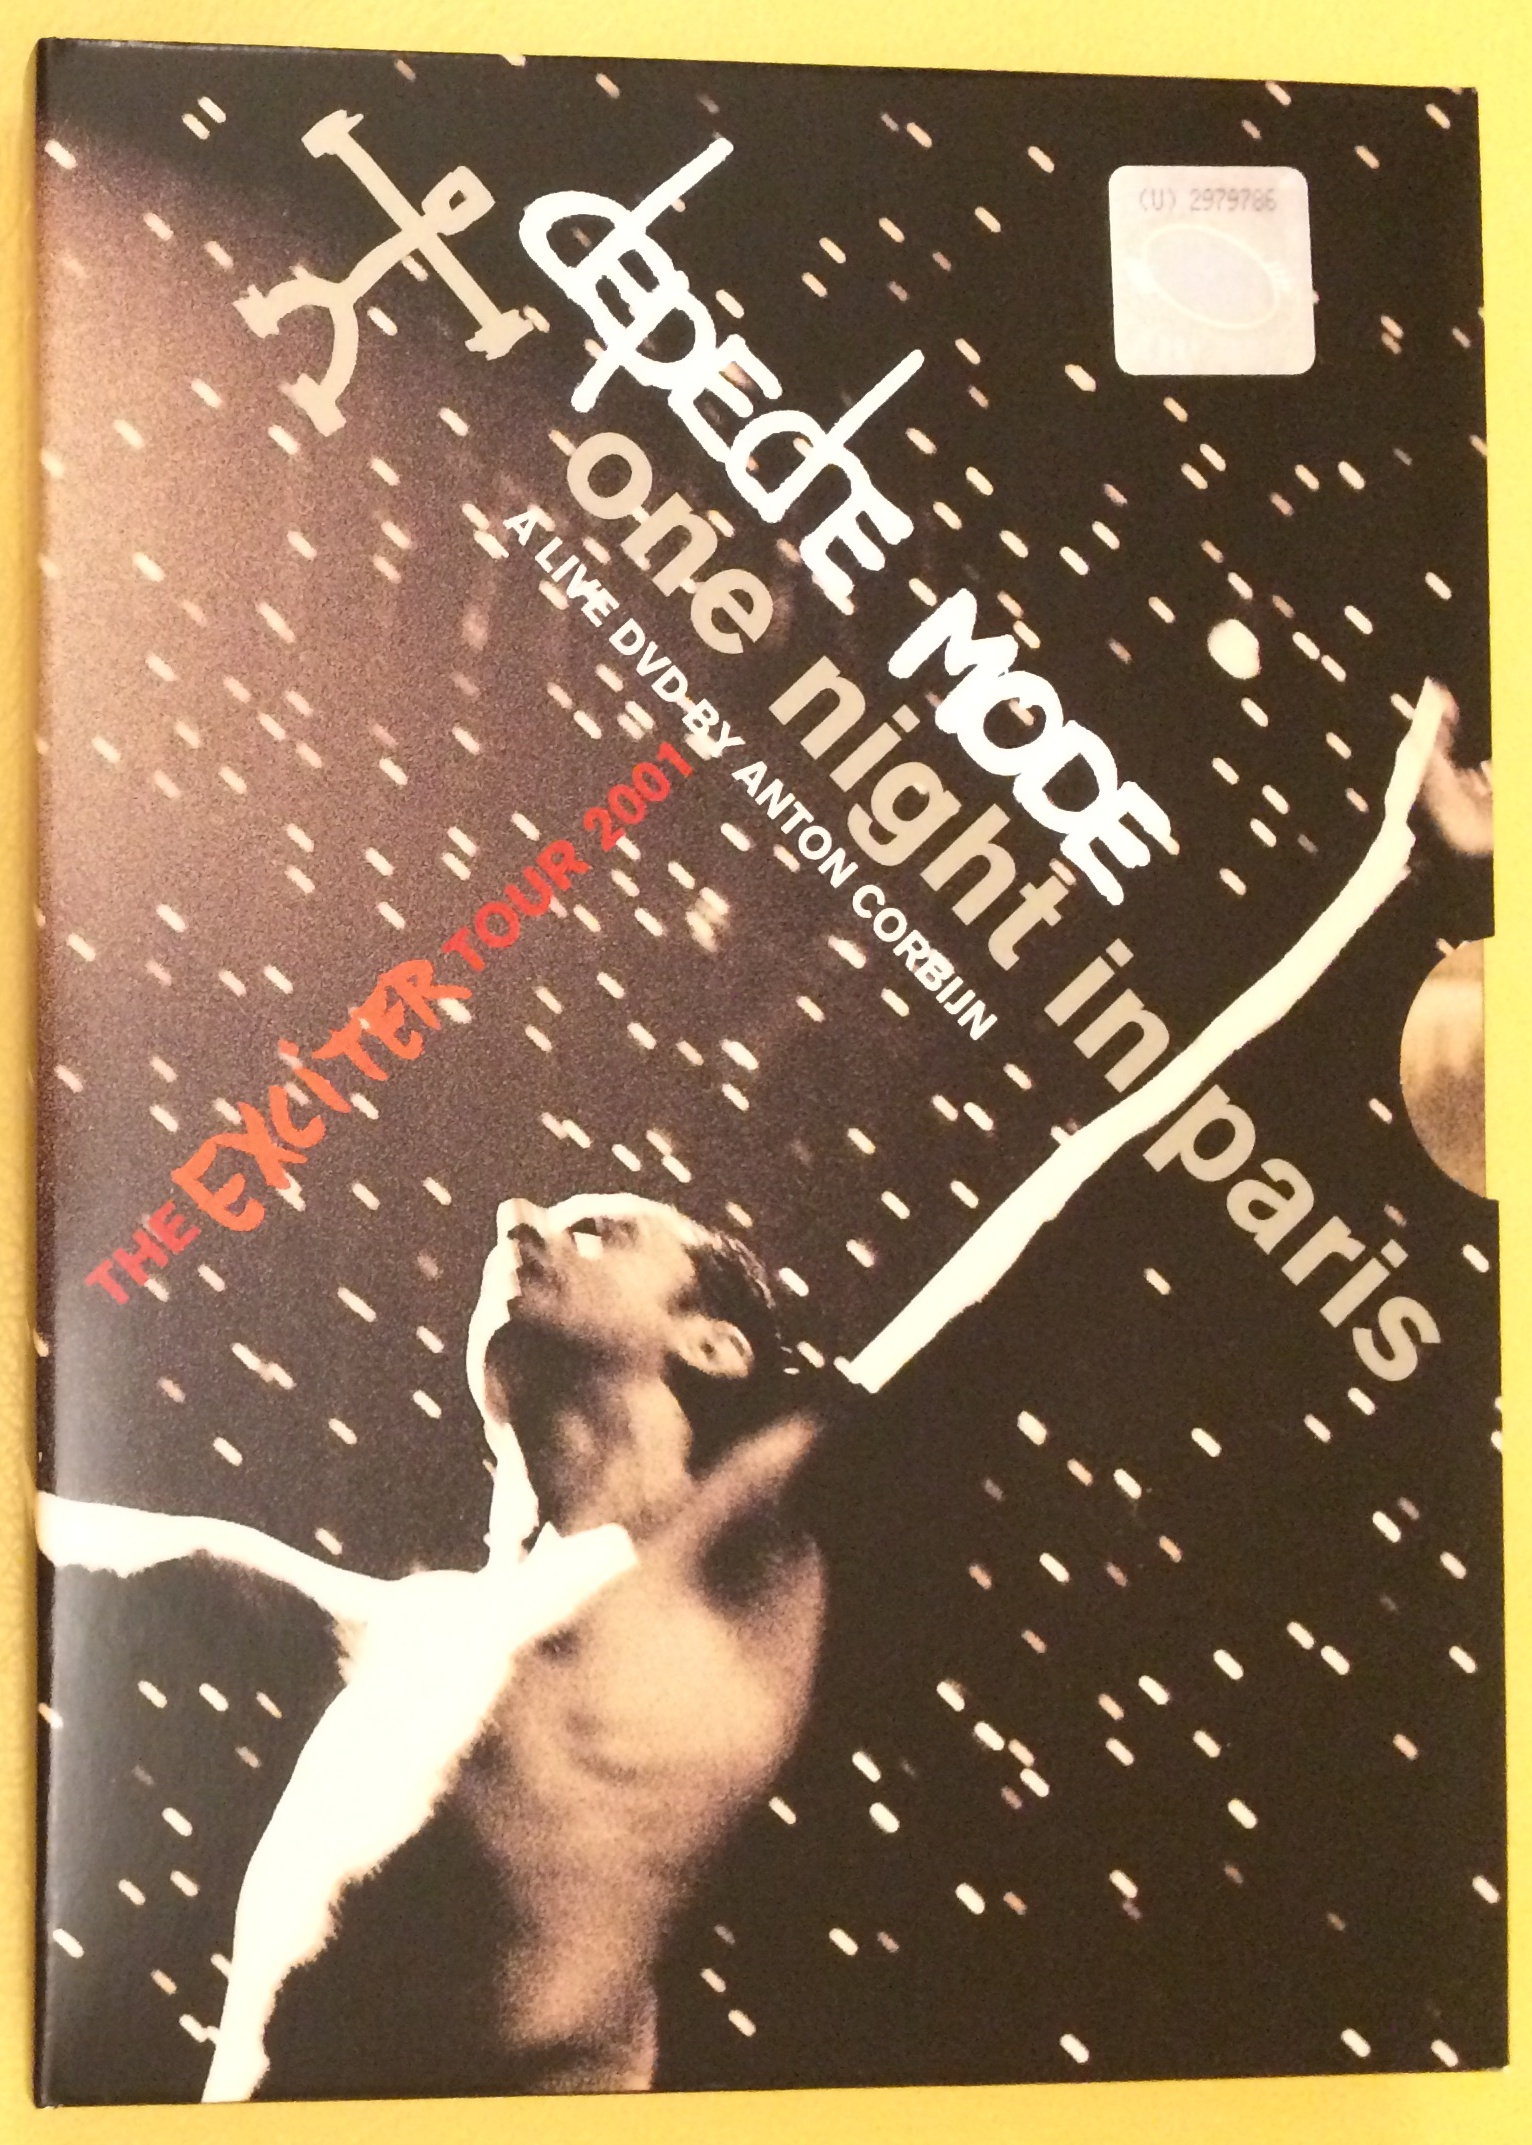 Depeche Mode - One Night In Paris (2002) [2DVD]